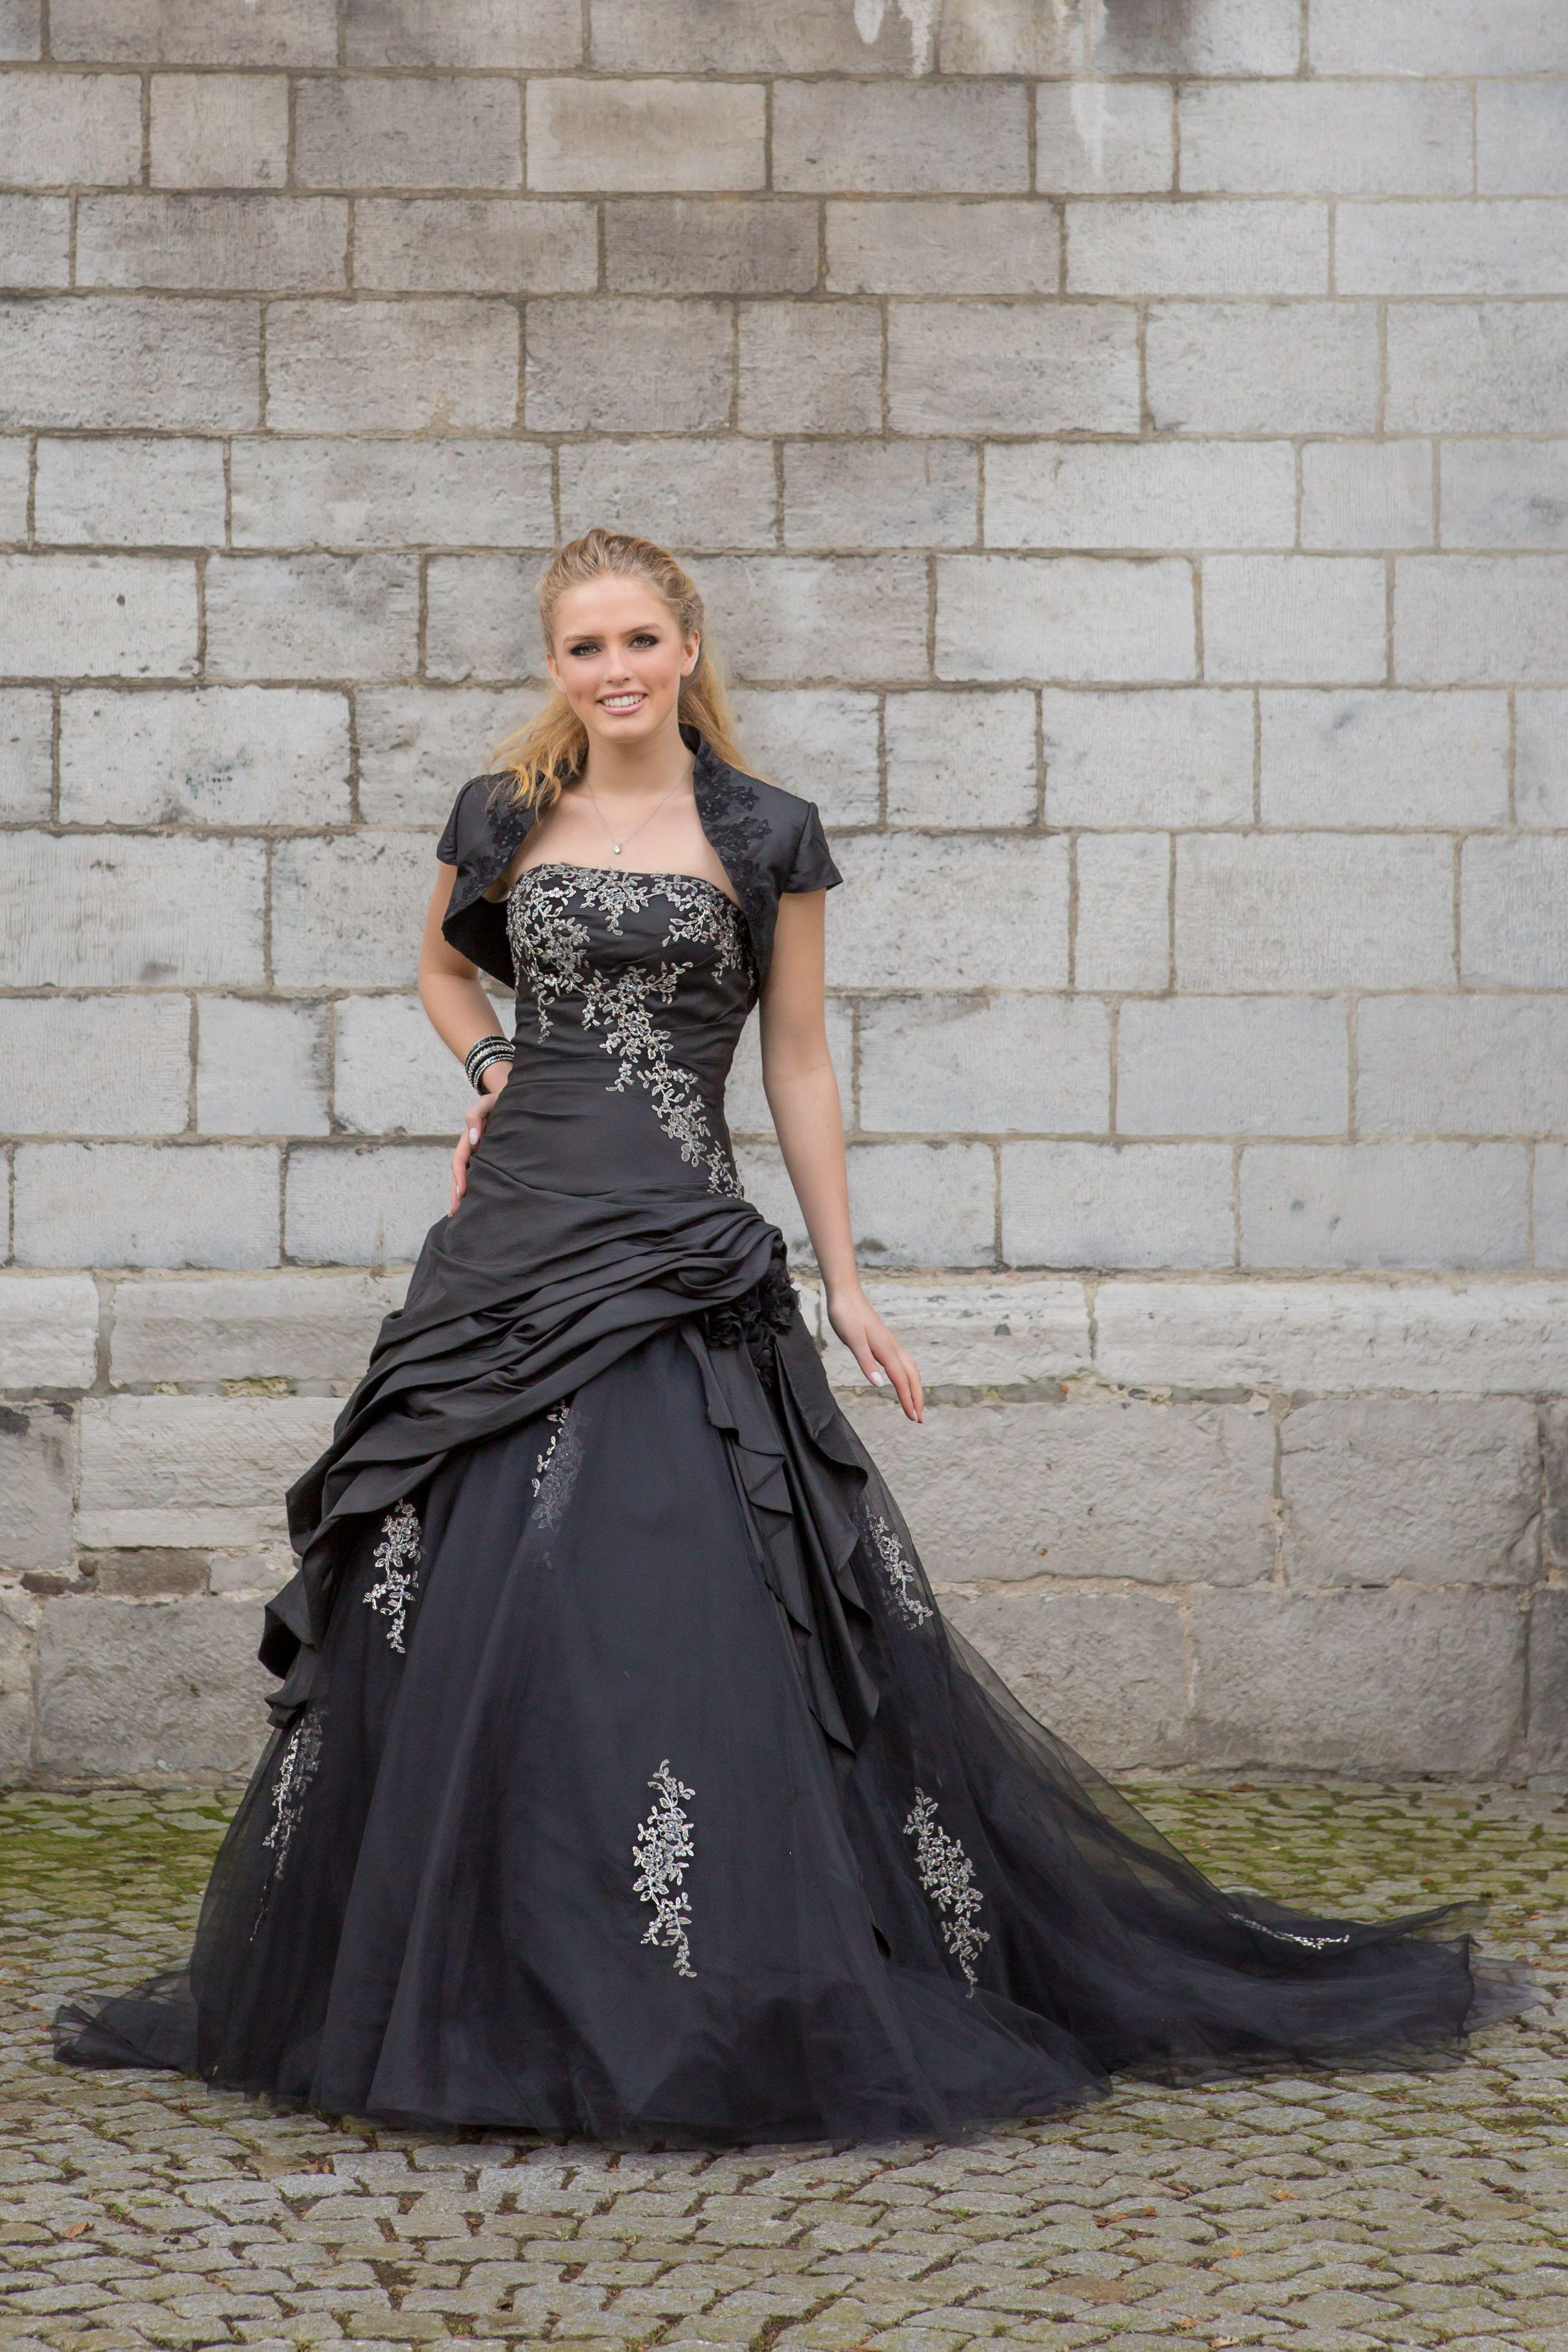 She Was A Long Cool Woman In A Black Dress Dress Cambria Bridalstar Festive 2016 17 Brides Love Bridalstar Festive Dress Bruidsmode Elegant [ 4050 x 2700 Pixel ]